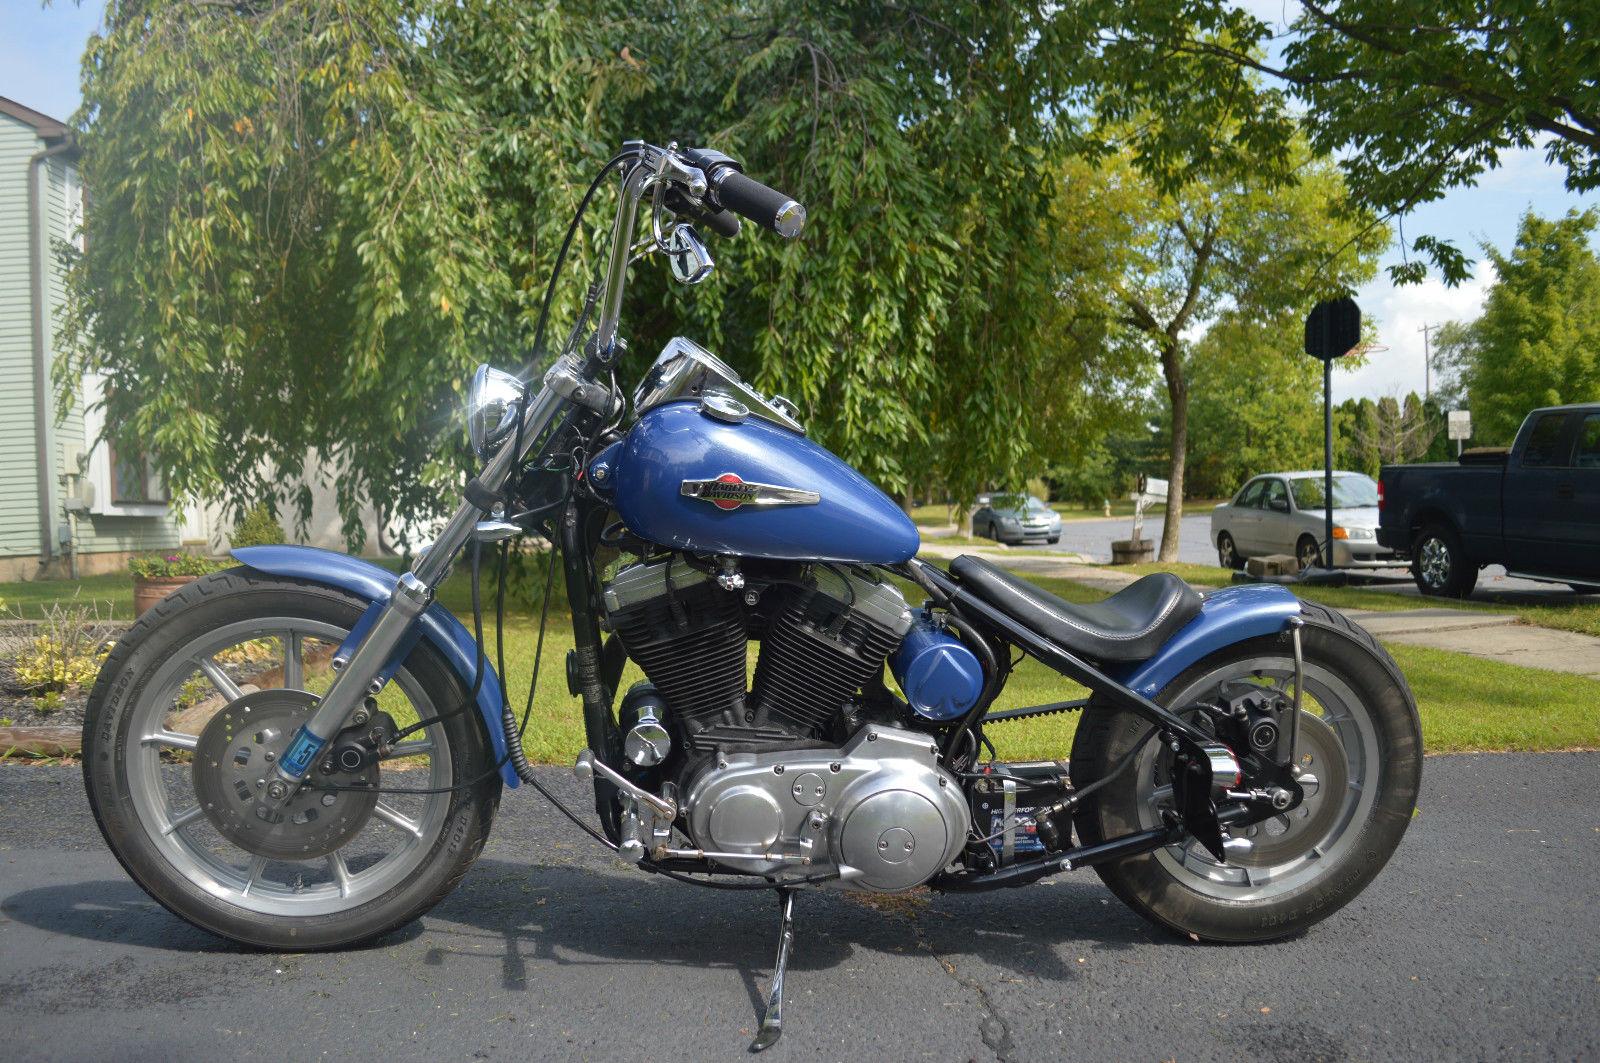 Harley Davidson Evo Sportster For Sale